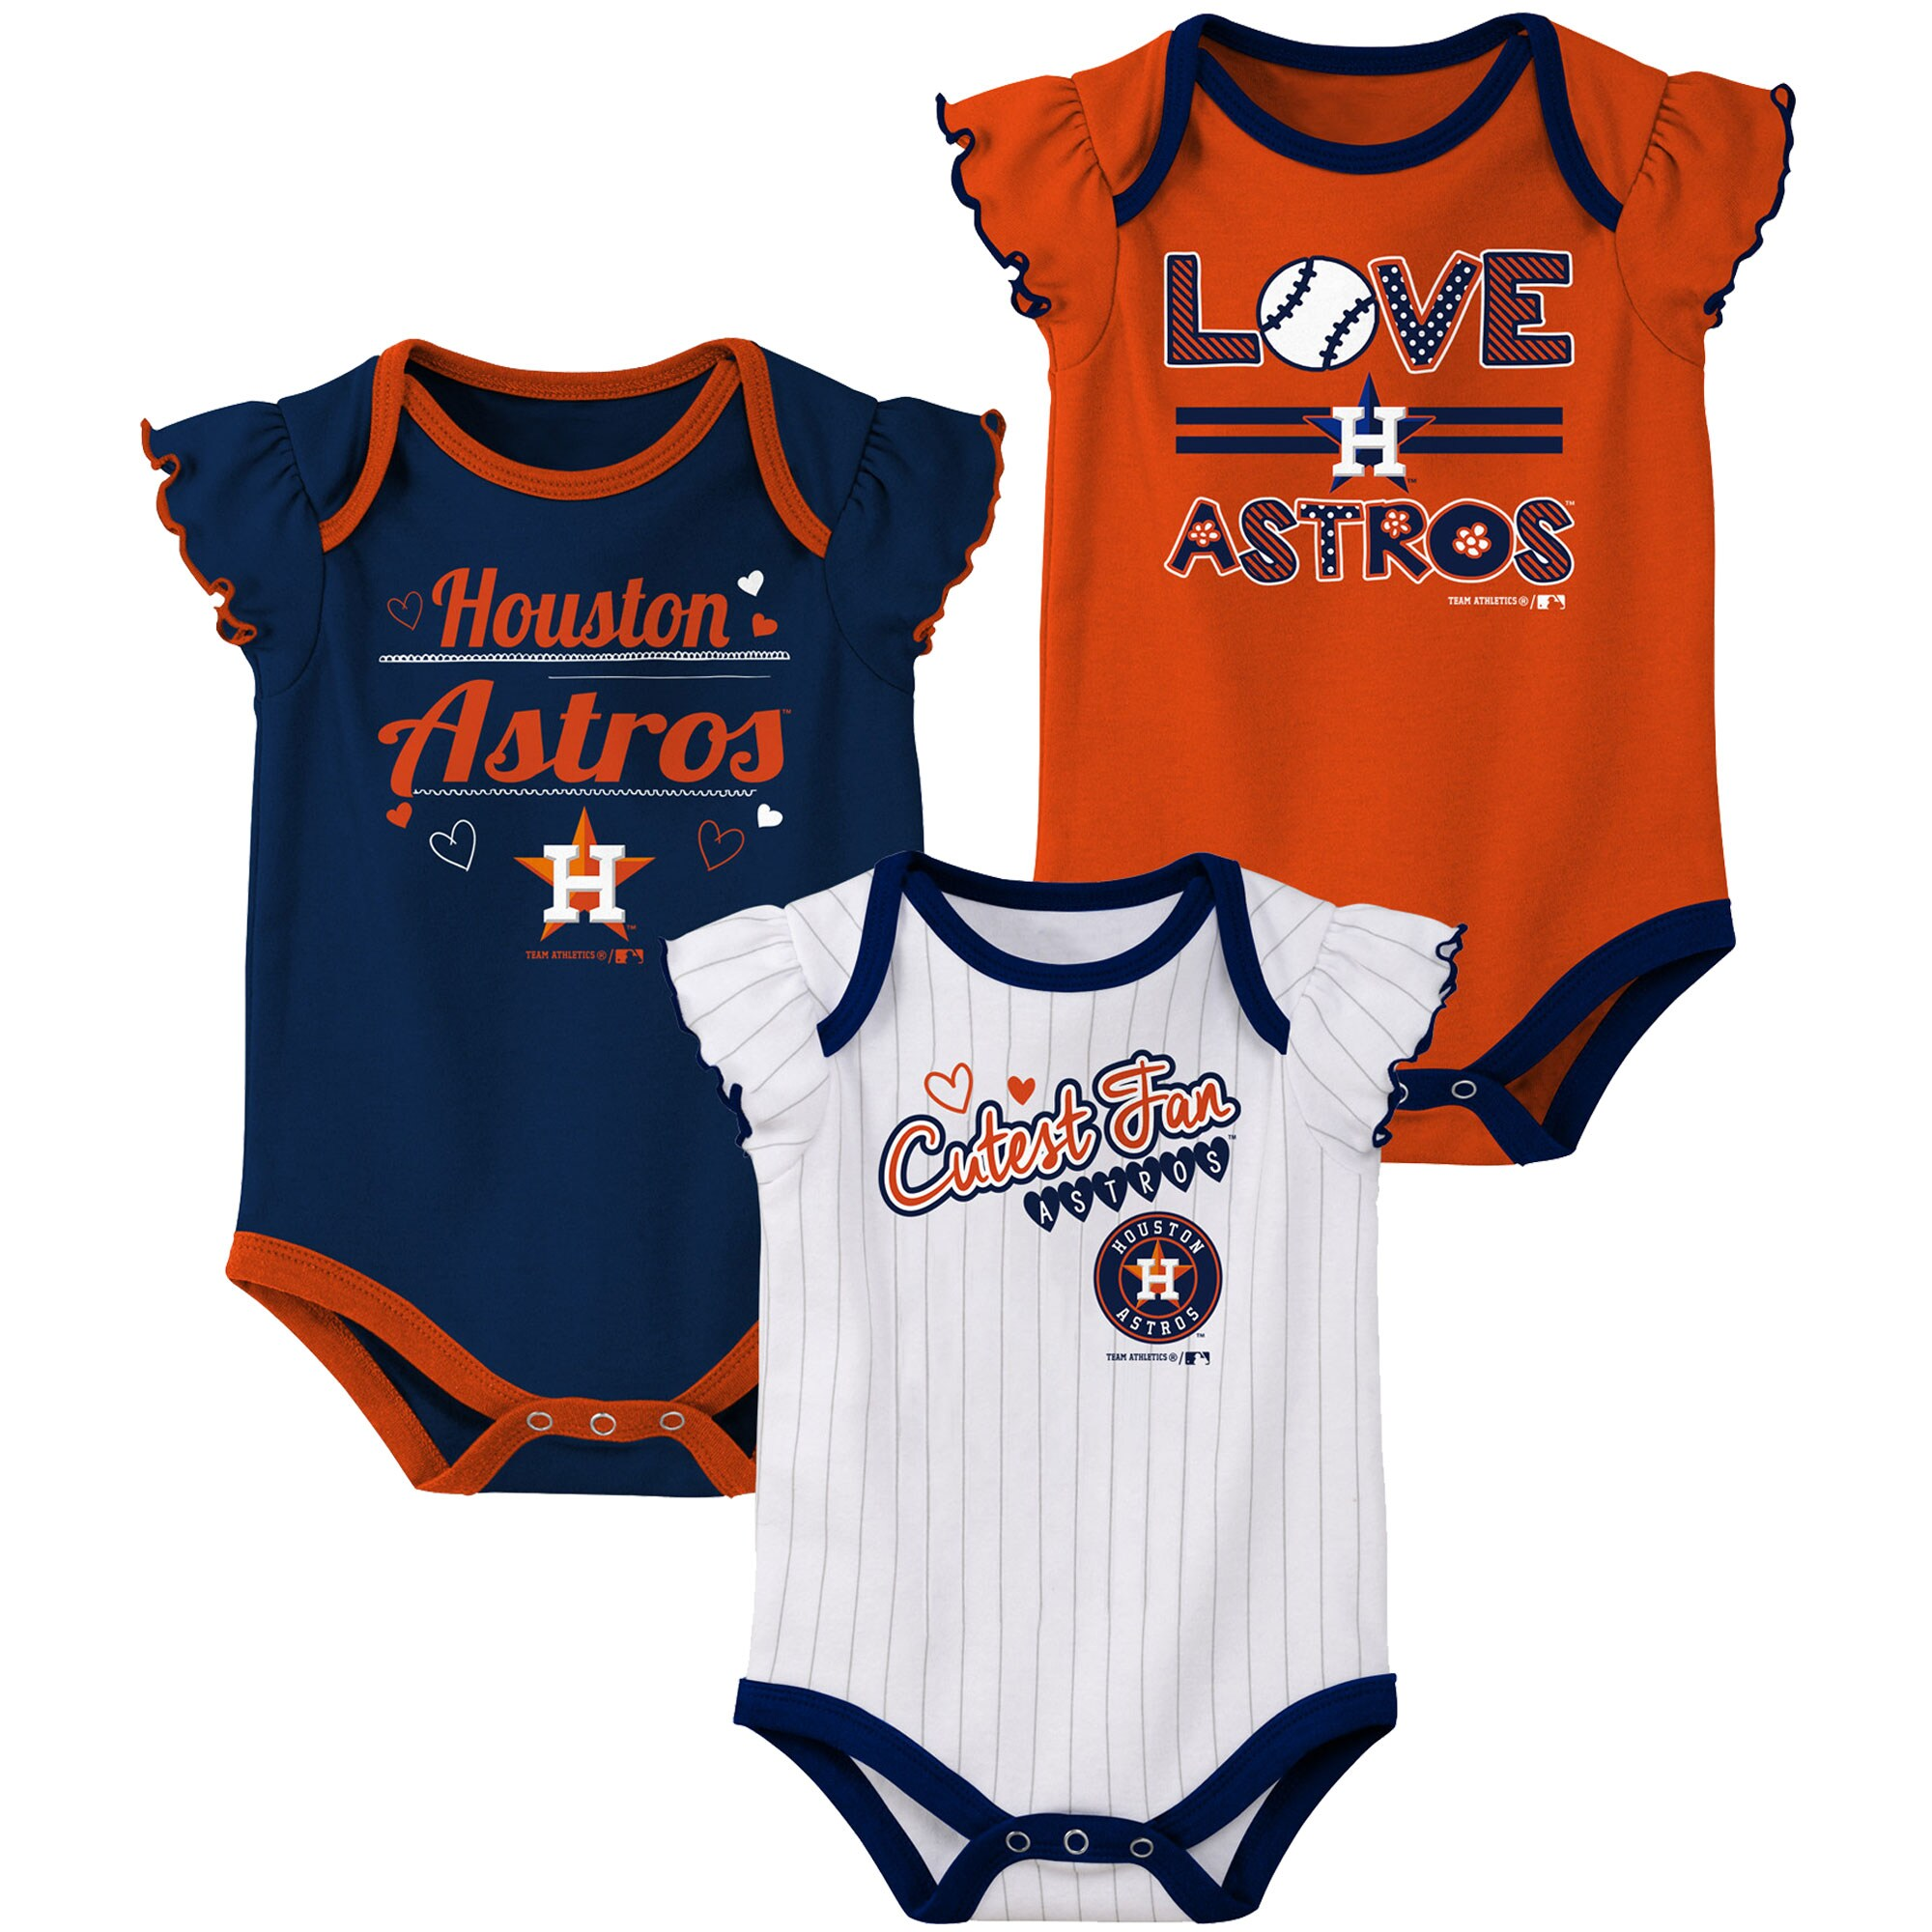 Astros Baby Girl Houston Astros Baby Girl Game Day Outfit Houston Astros Baby Clothes Astros Bodysuit